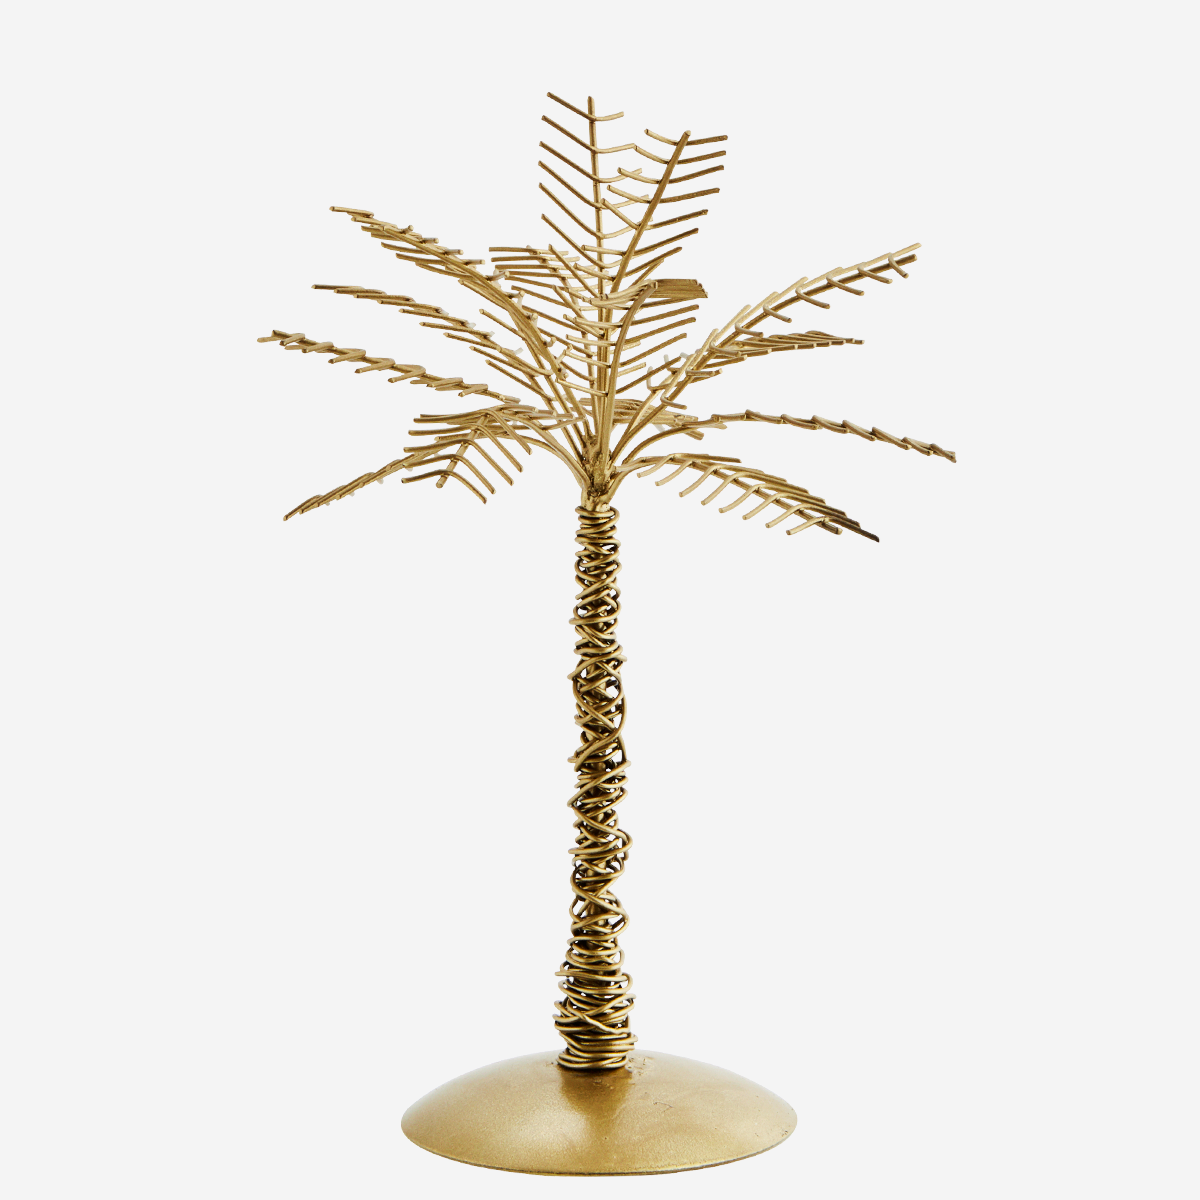 Iron Palm Tree, Antique Brass by Madam Stoltz